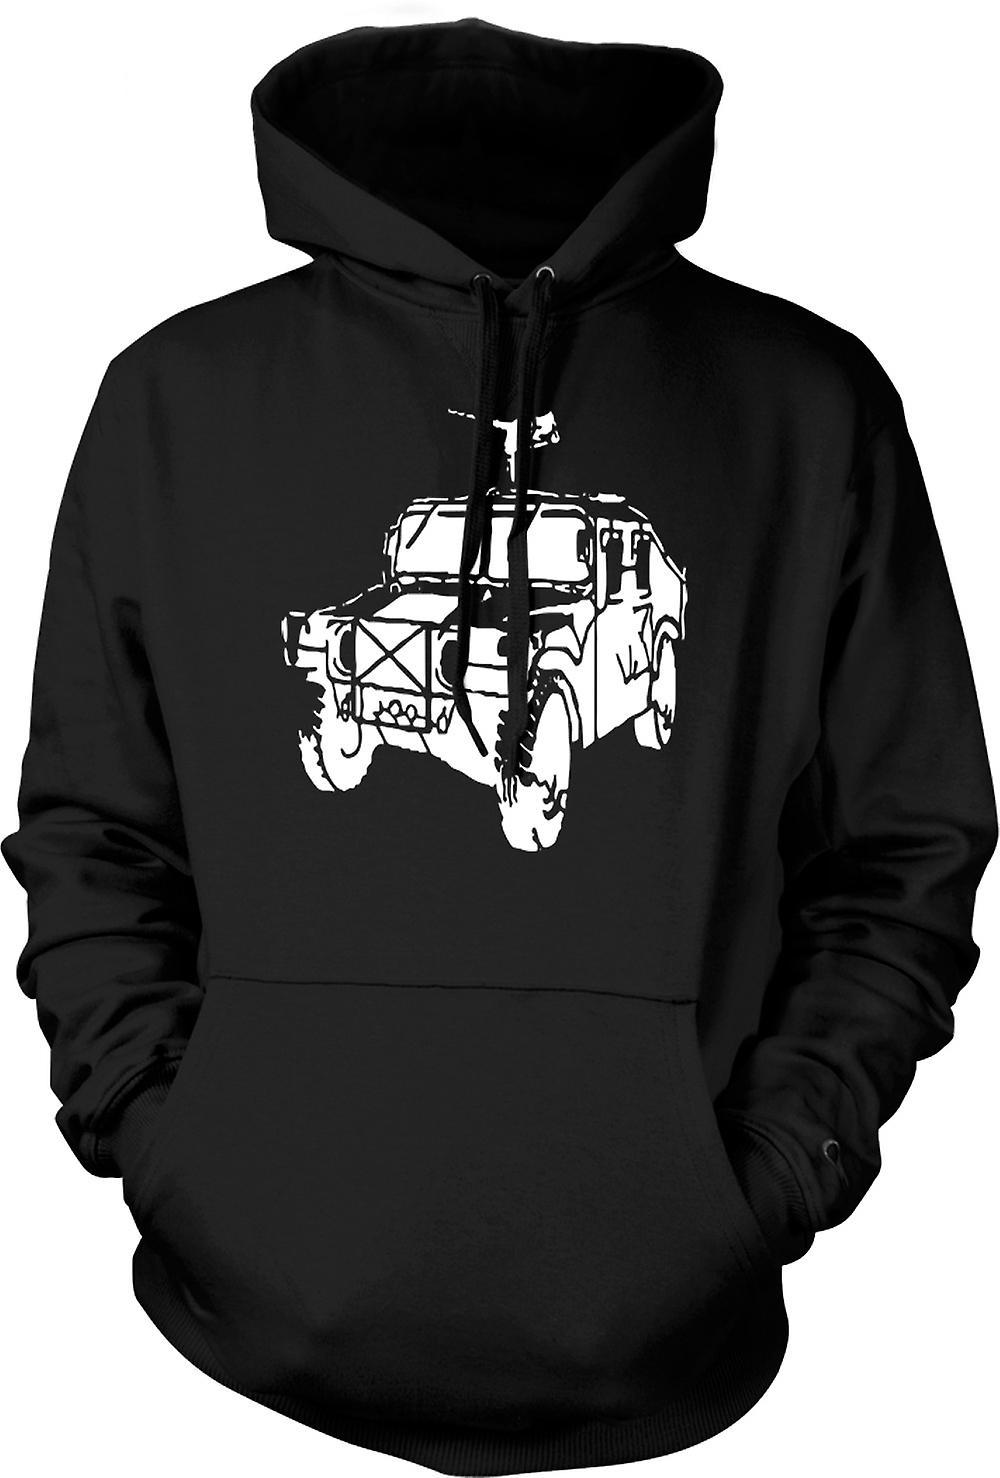 Mens hettegenser - US Army Humvee 50 Cal - militære